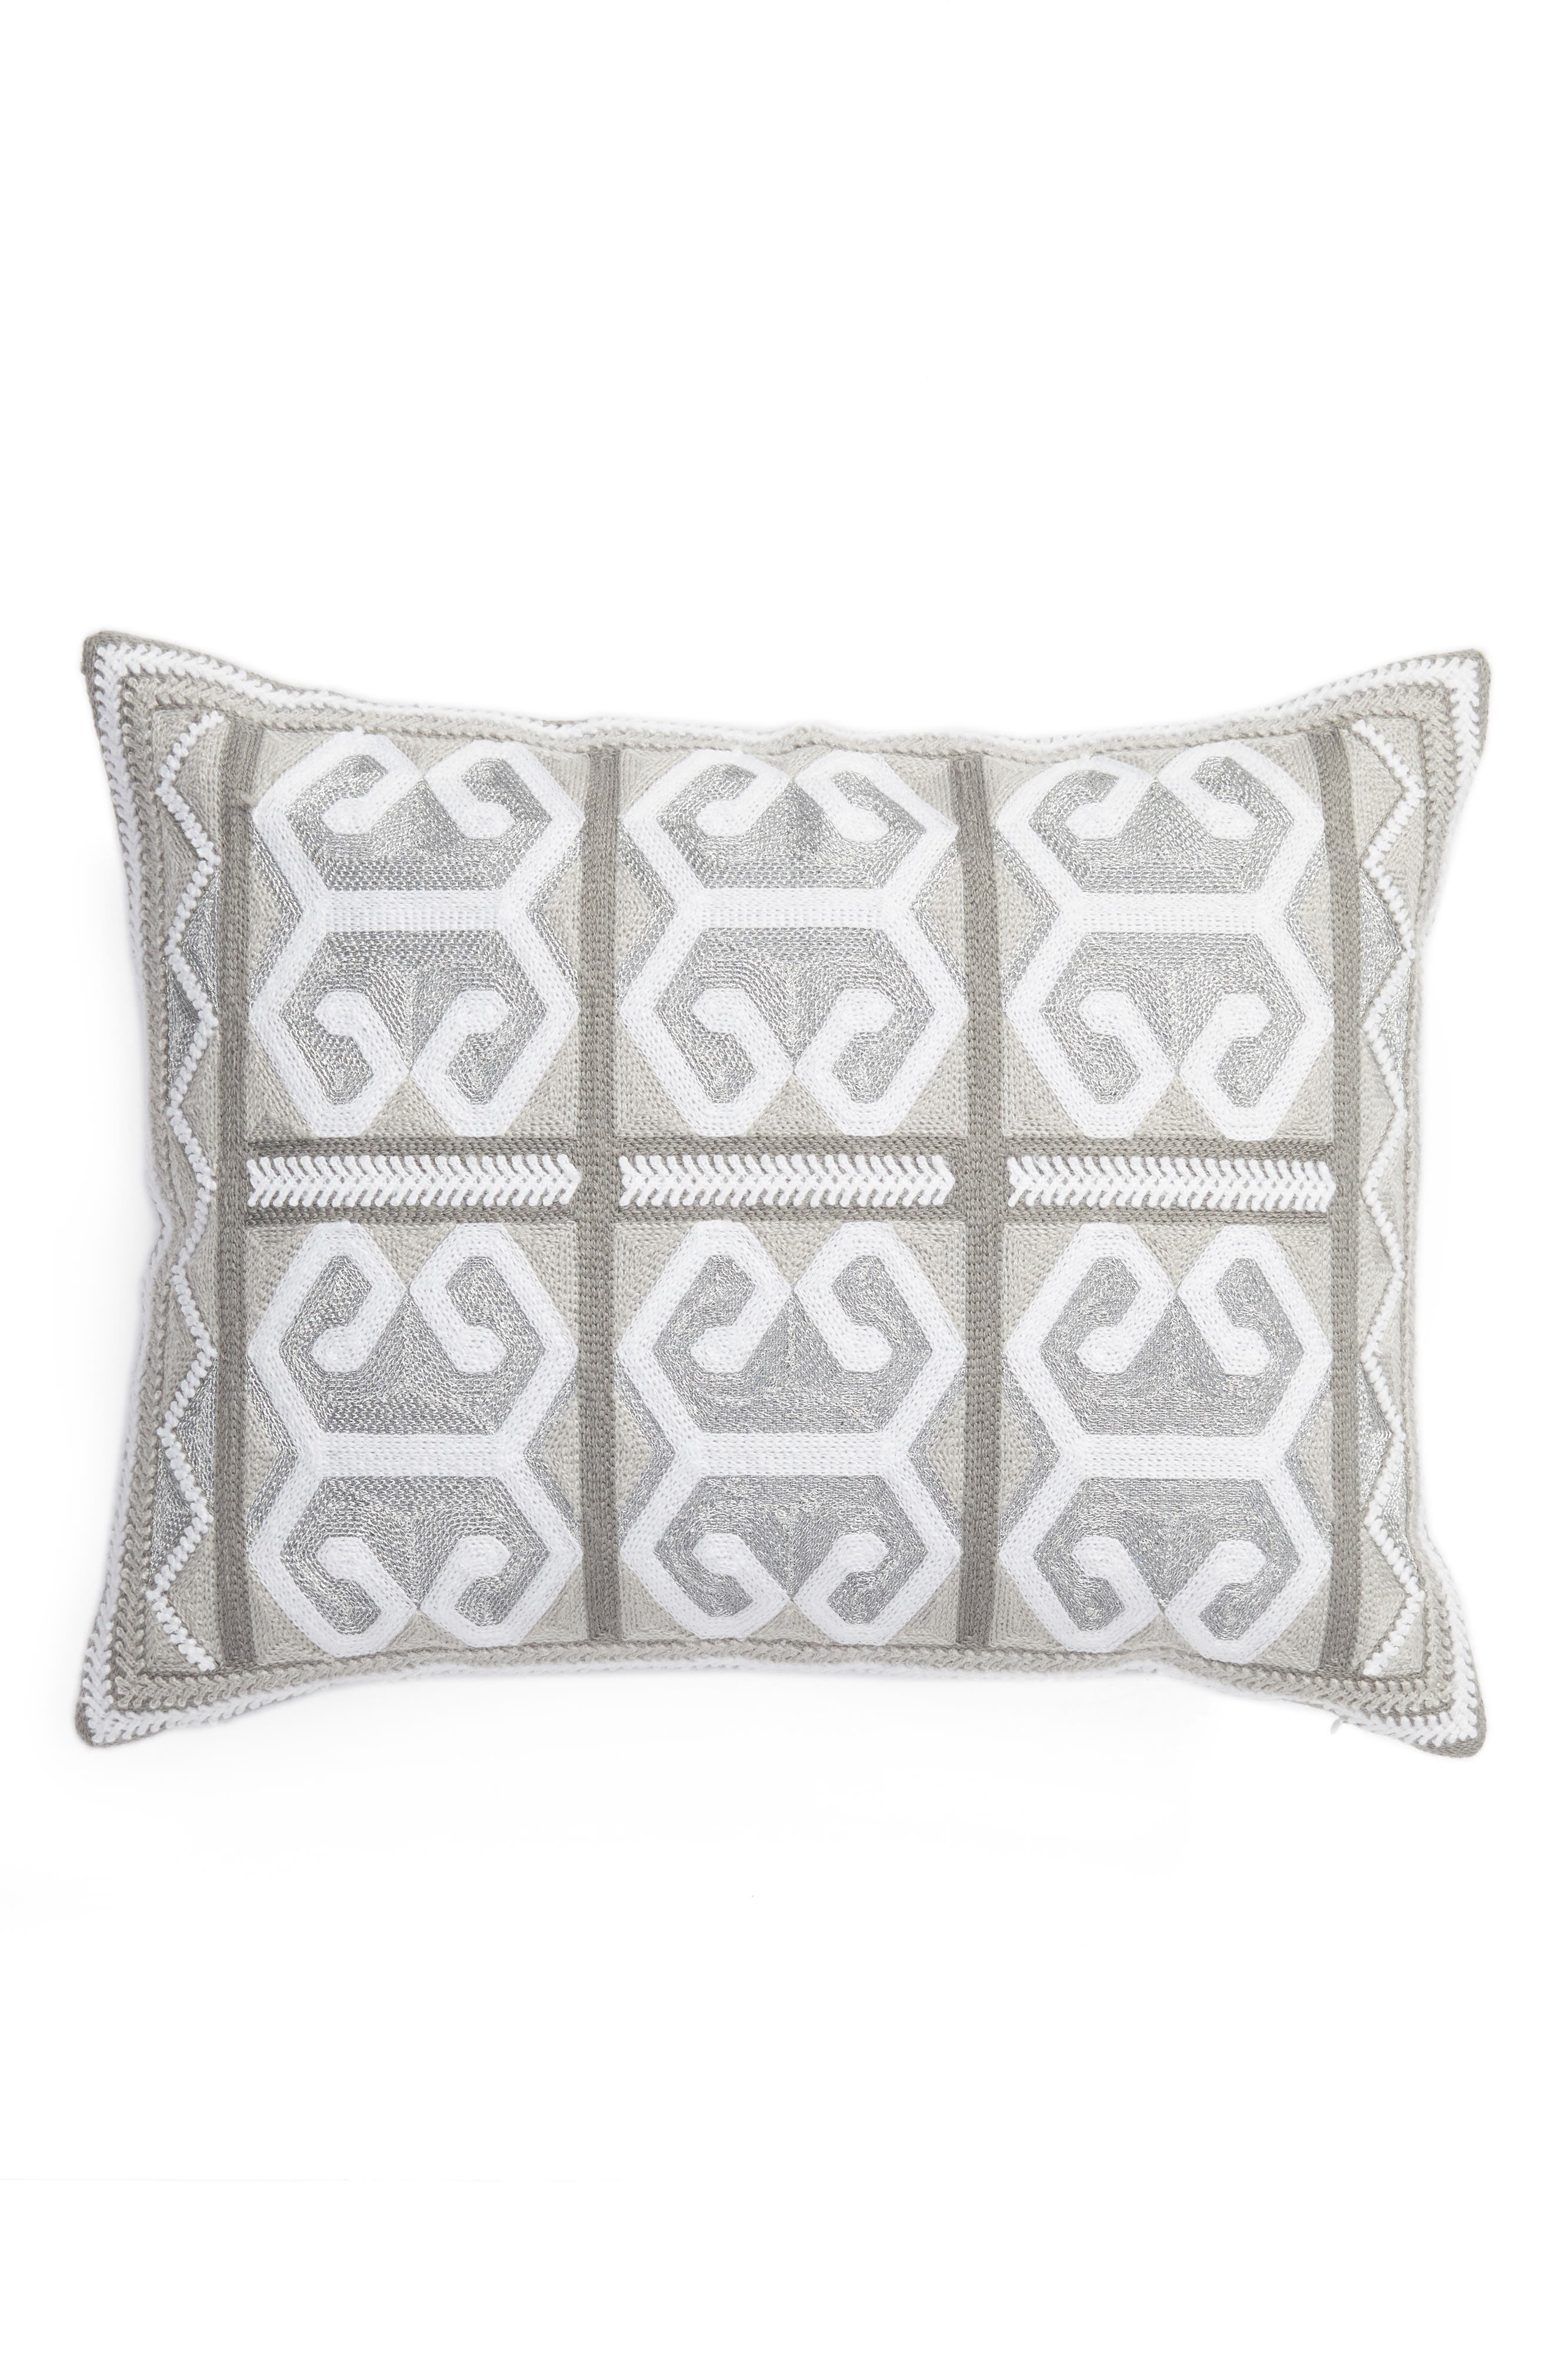 Levtex Caleb Crewel Stitch Accent Pillow